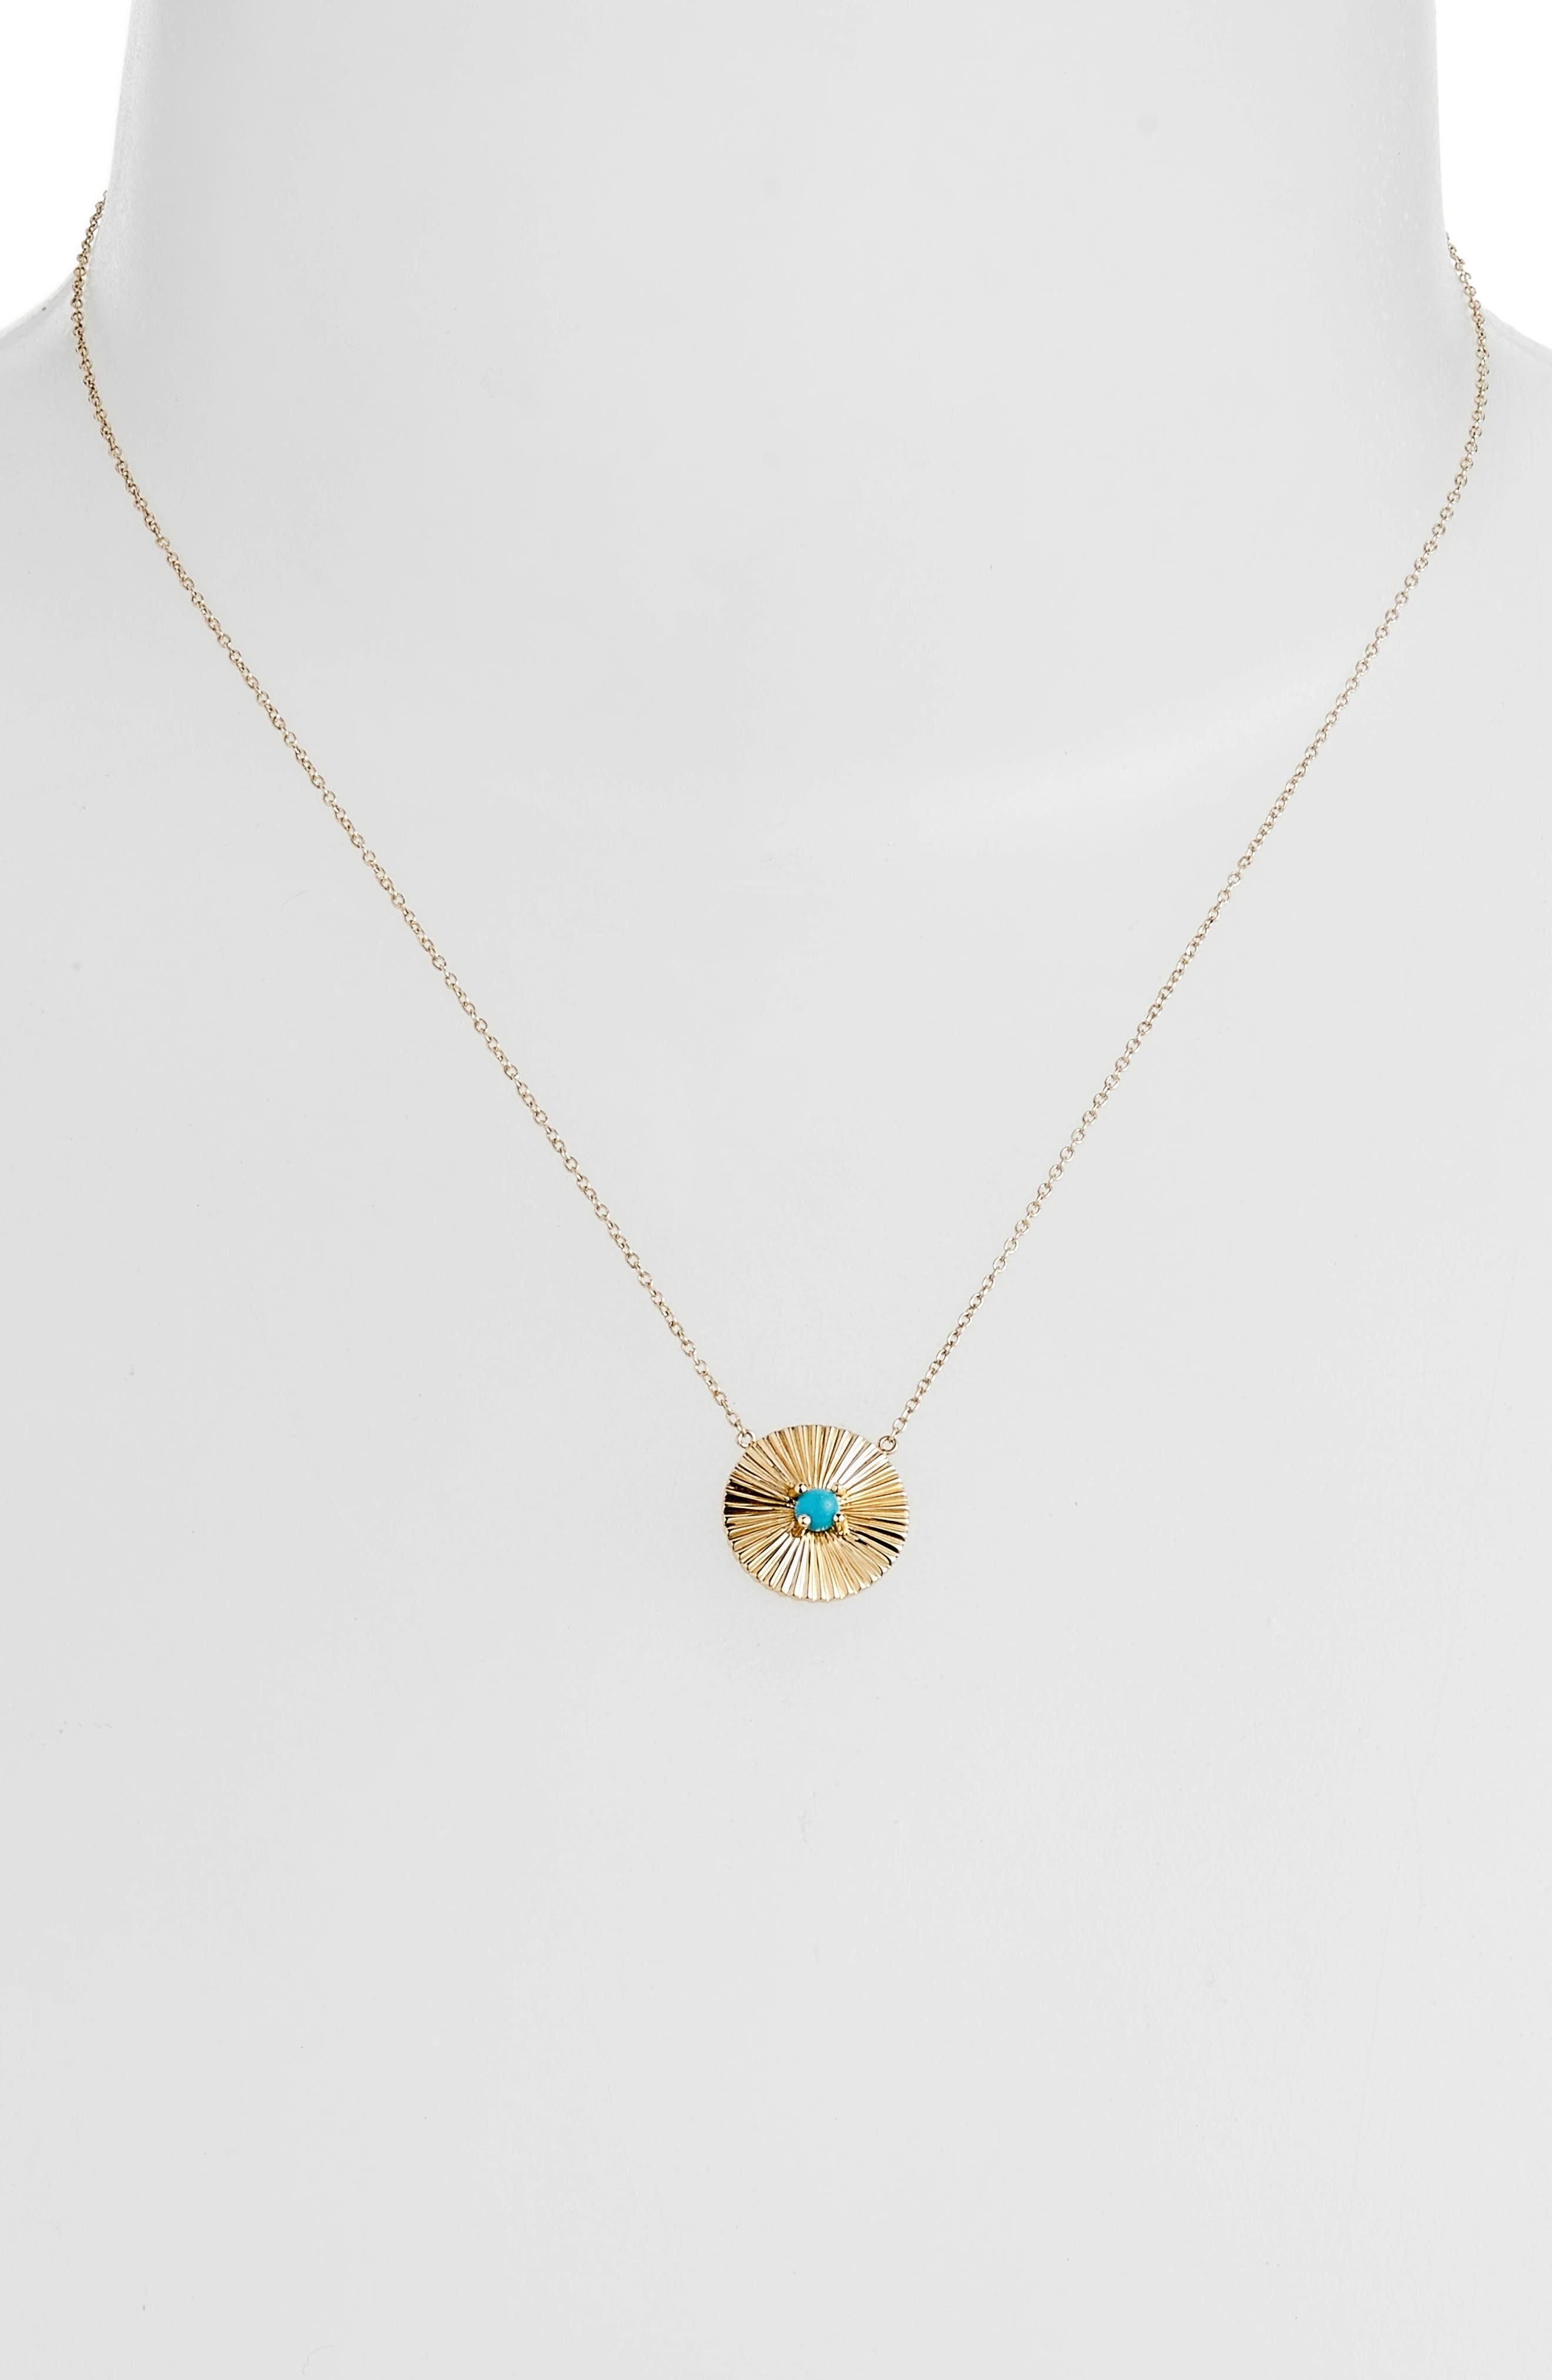 Iris Carson Turquoise Pendant Necklace,                             Alternate thumbnail 2, color,                             YELLOW VERMEIL